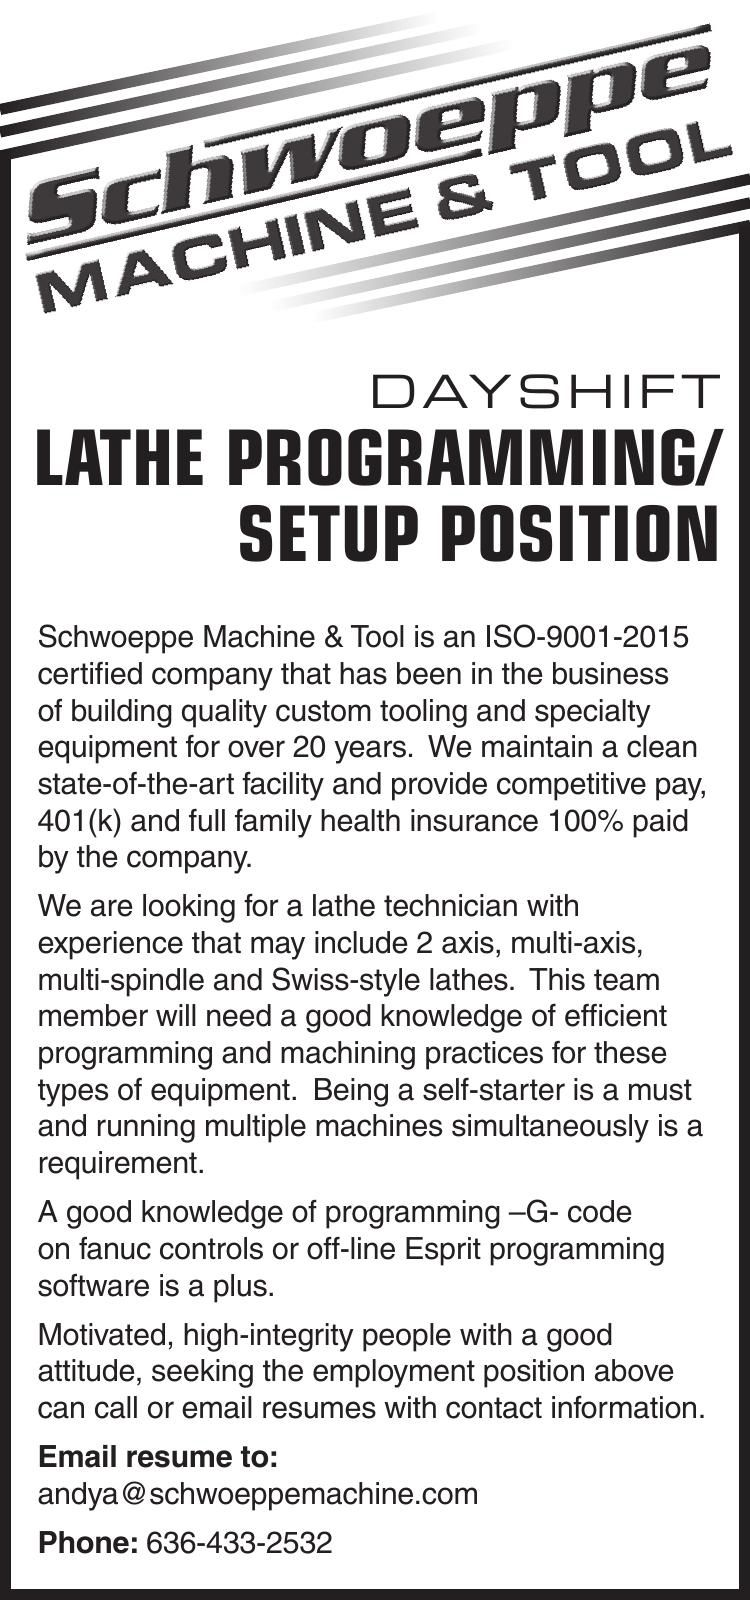 LATHE PROGRAMMING/ SETUP POSITION